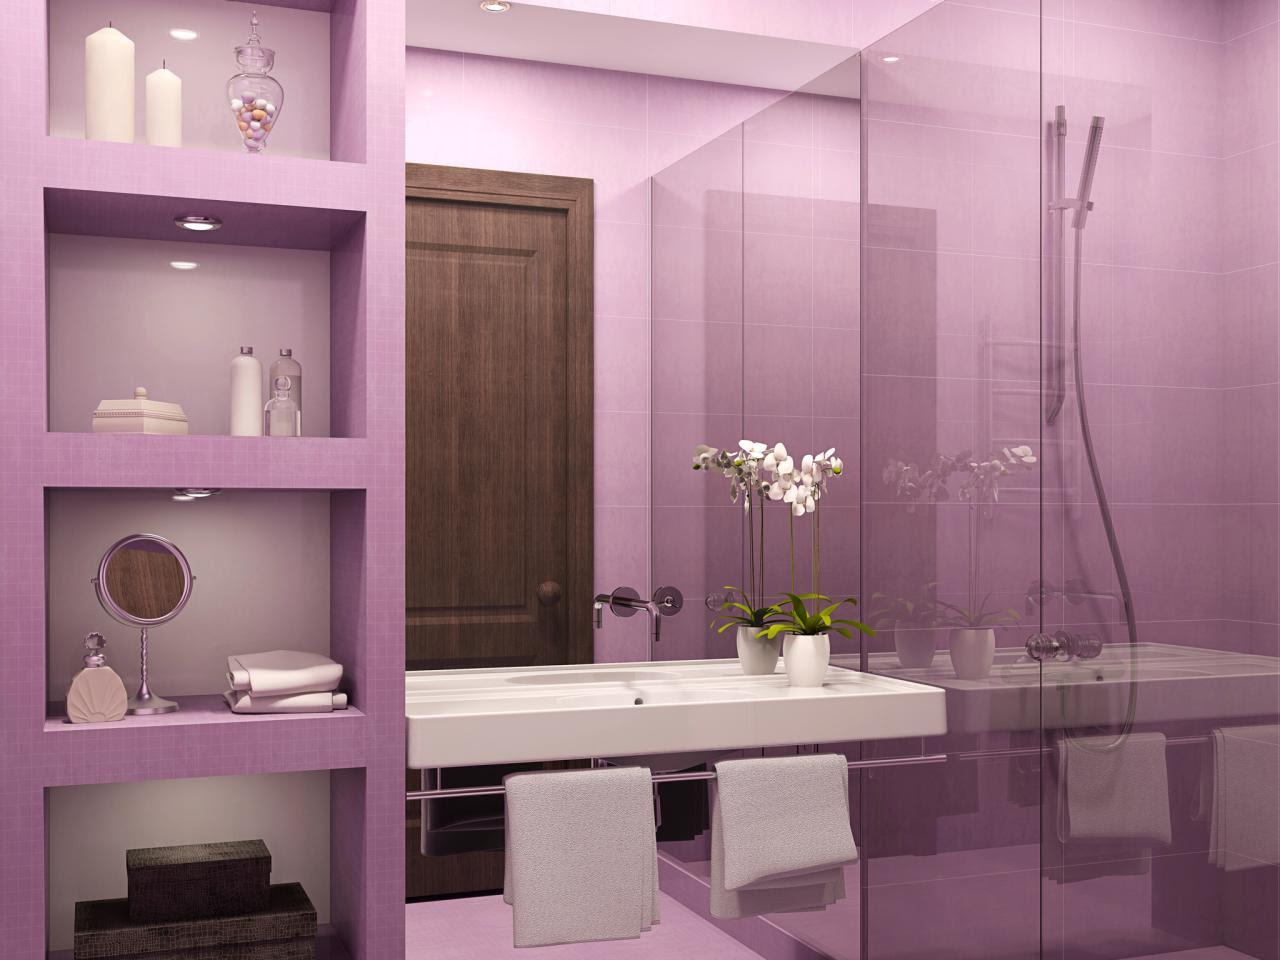 Purple Bathroom Decor: Pictures, Ideas & Tips From HGTV | HGTV